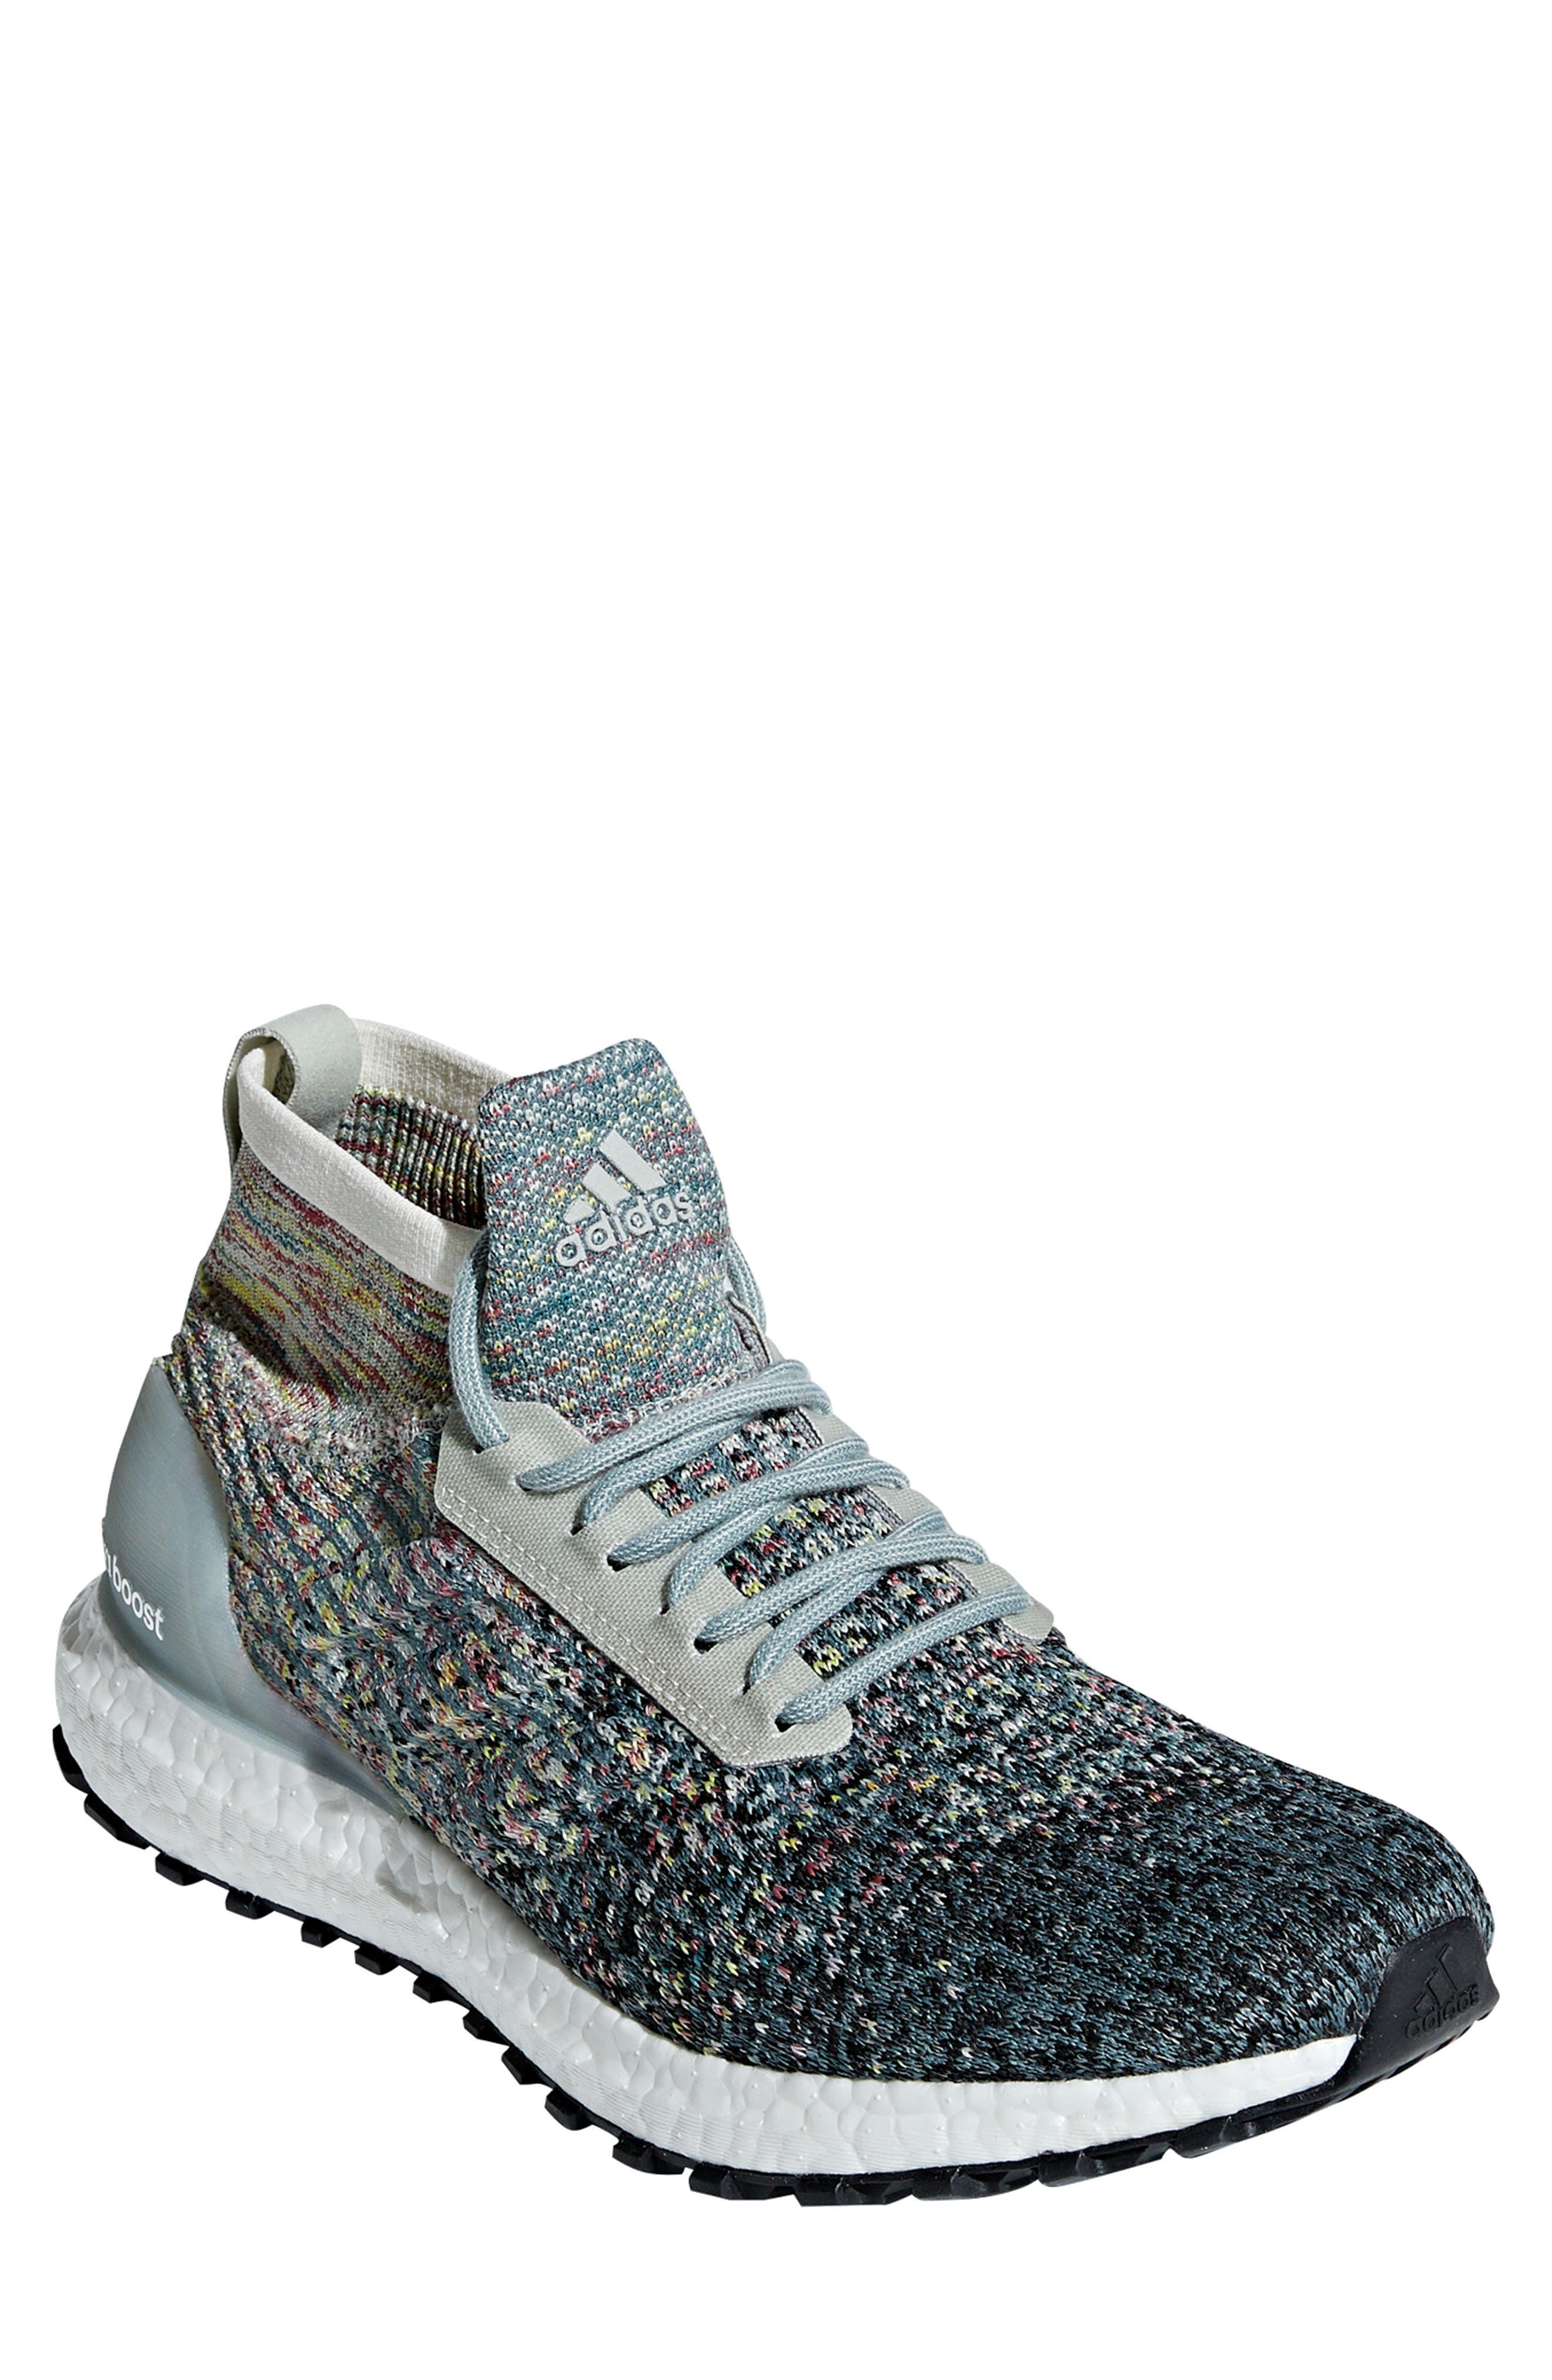 UltraBoost All Terrain LTD Running Shoe,                         Main,                         color, ASH SILVER/ CARBON/ BLACK